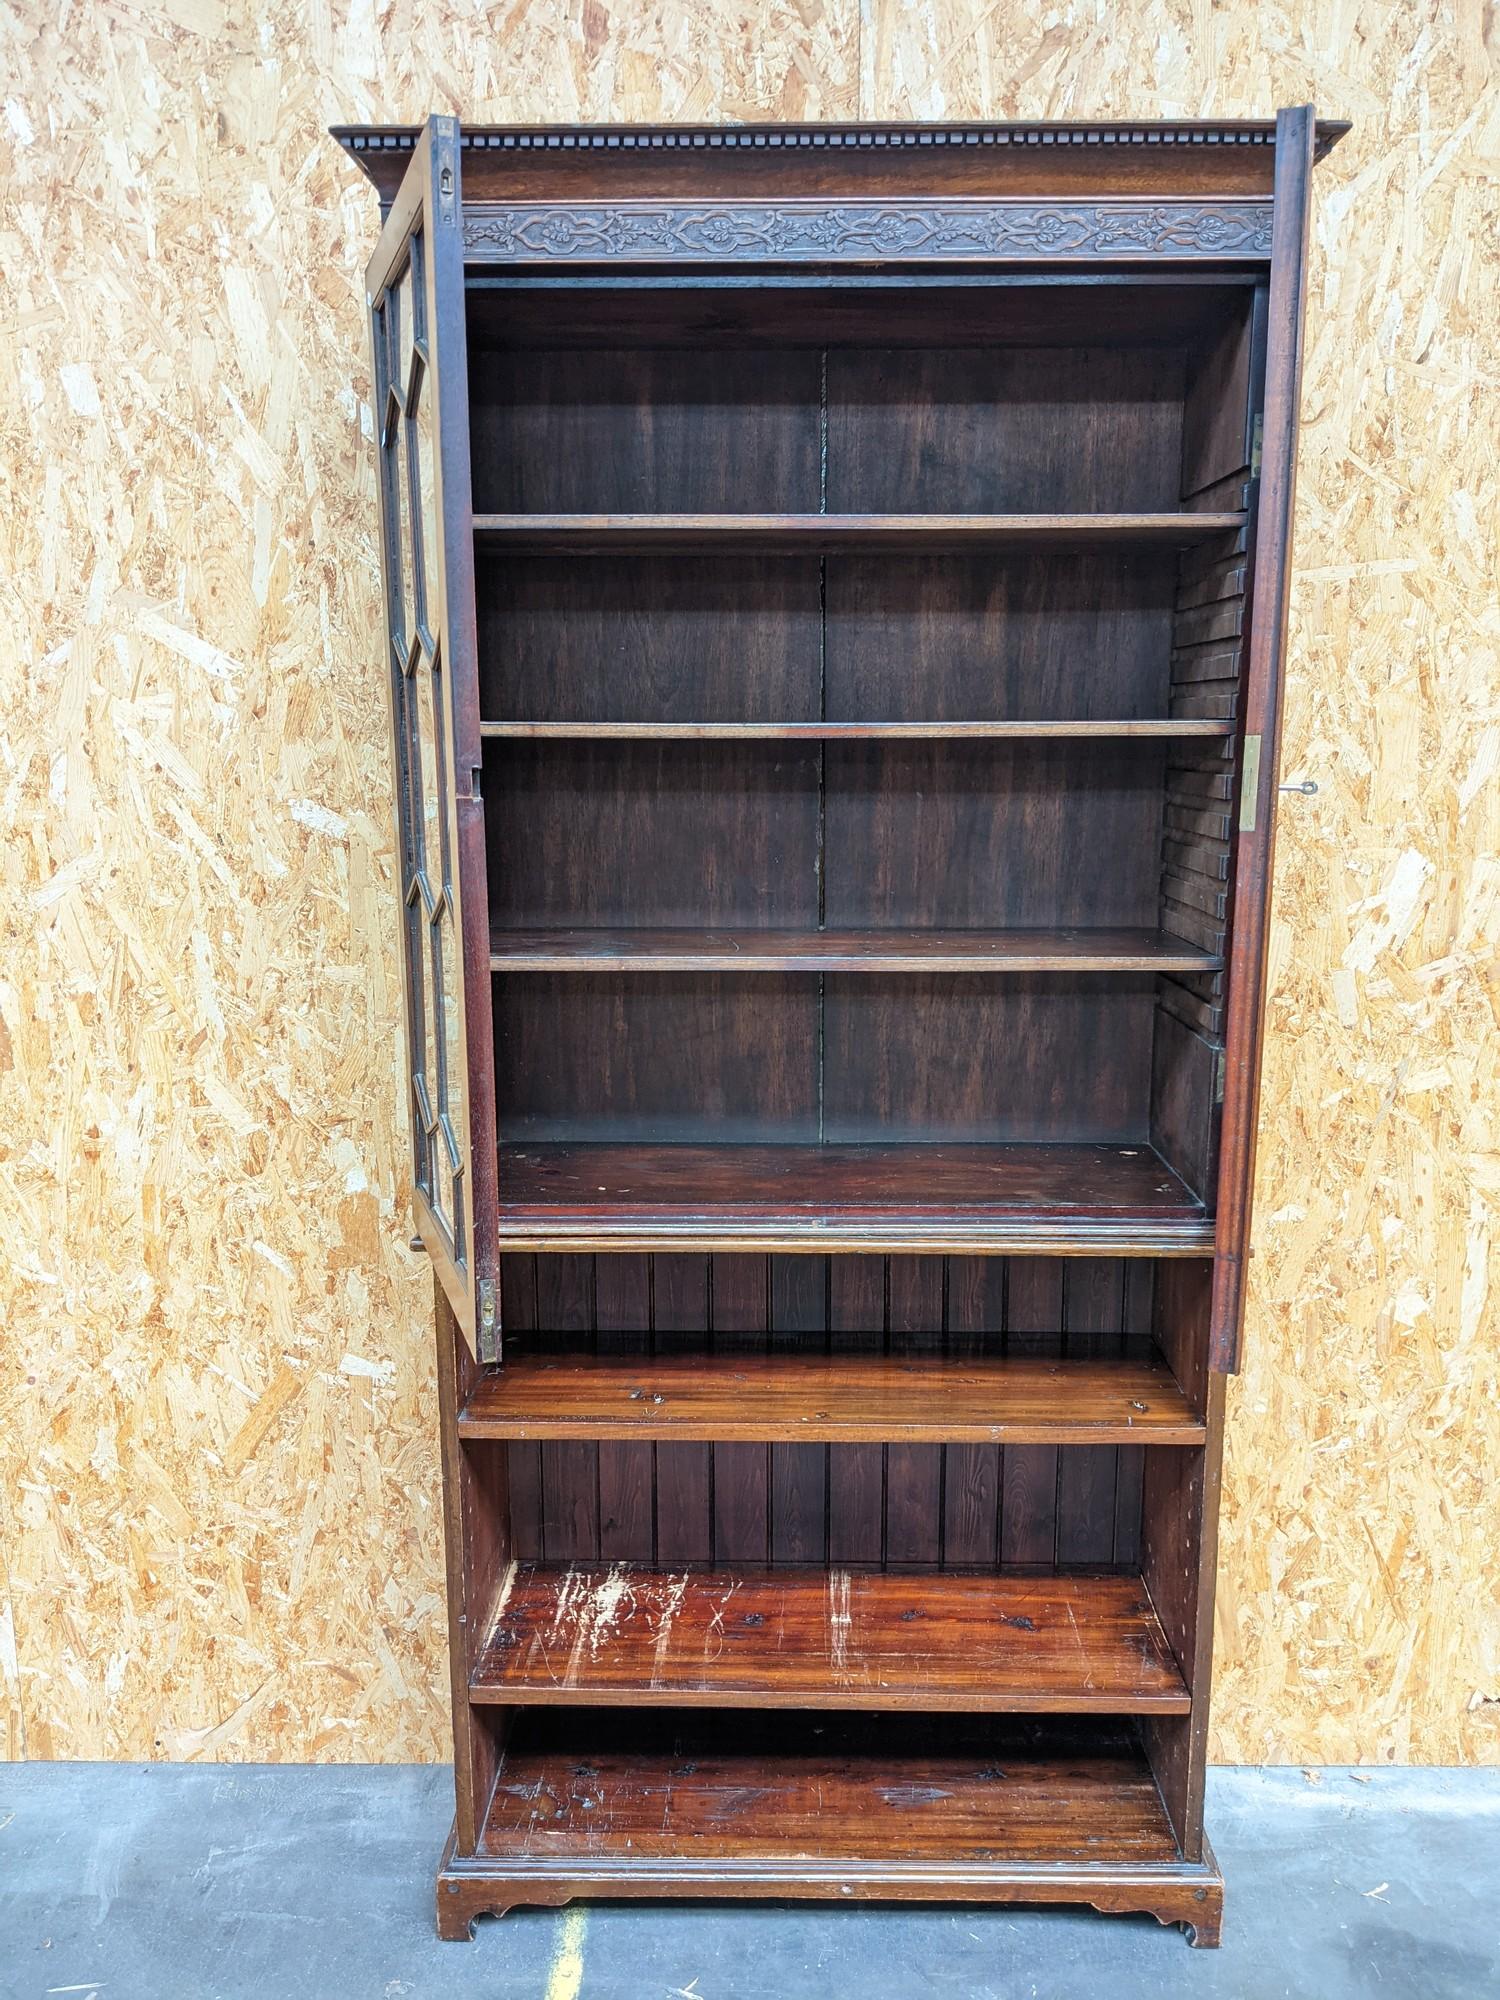 A display case/bookshelf [height, 2.07m, width, 96cm, depth, 34cm] - Image 2 of 2